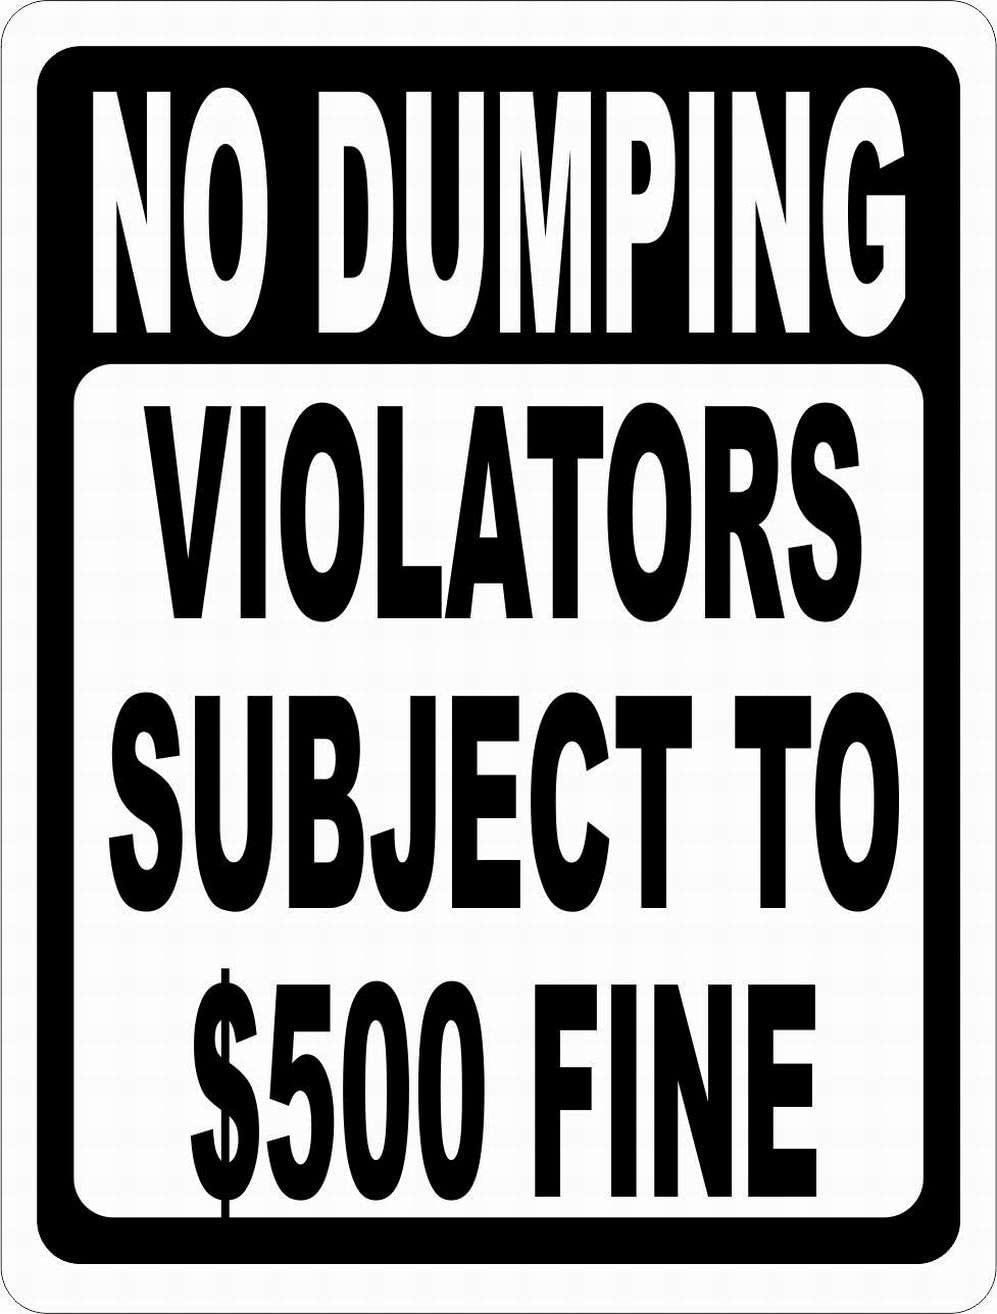 Fsdva Safety Sign Notice Danger Warning 8x12 Tin Sign Decor No Dumping Violators Subject to $500 Fine Sign